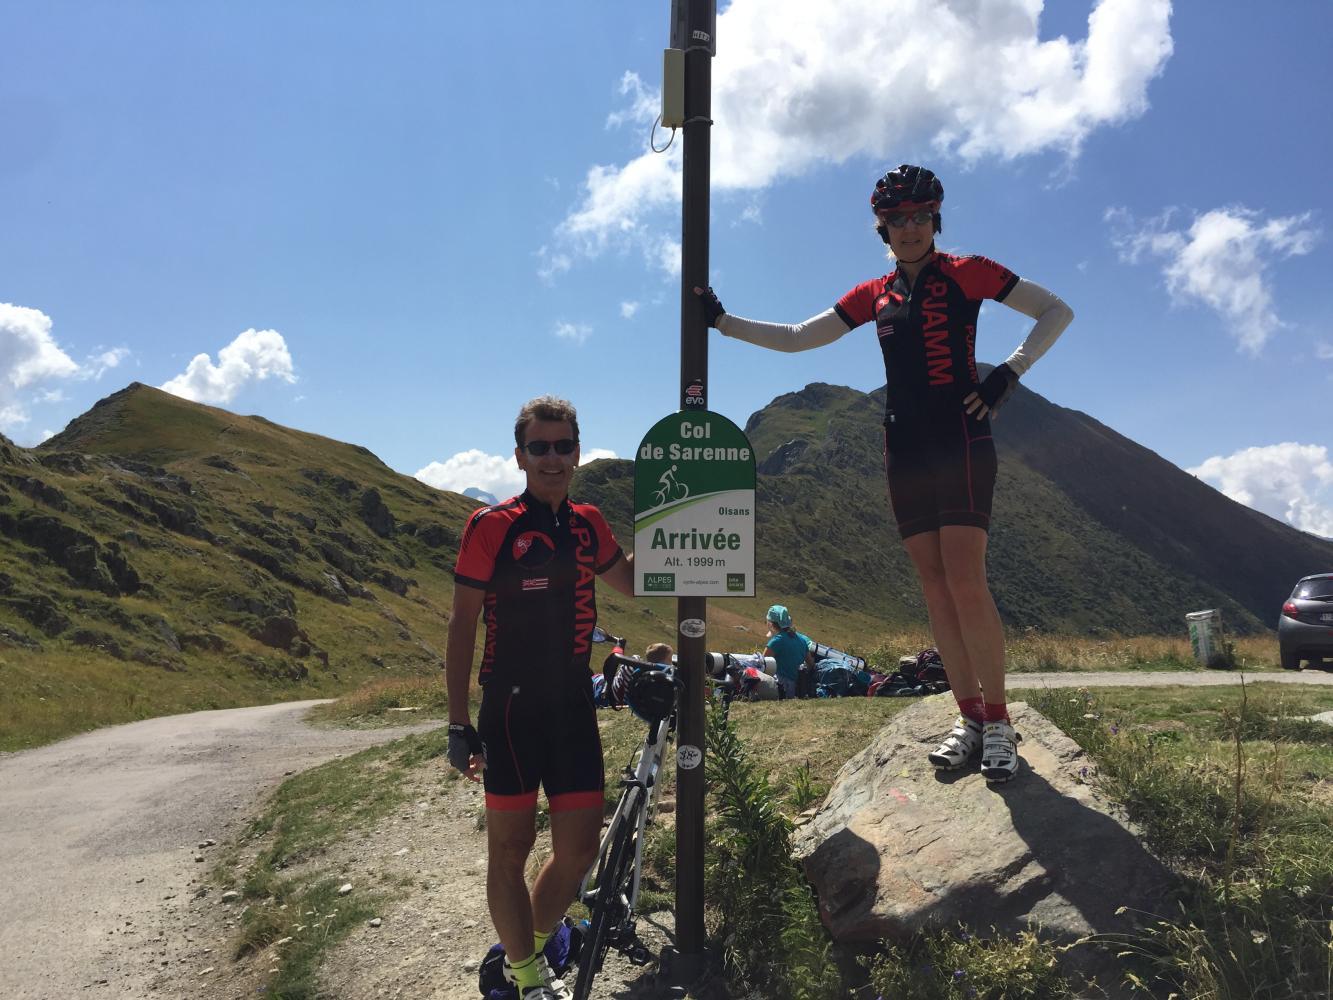 Col de Sarenne - Ouest Bike Climb - PJAMM Cycling